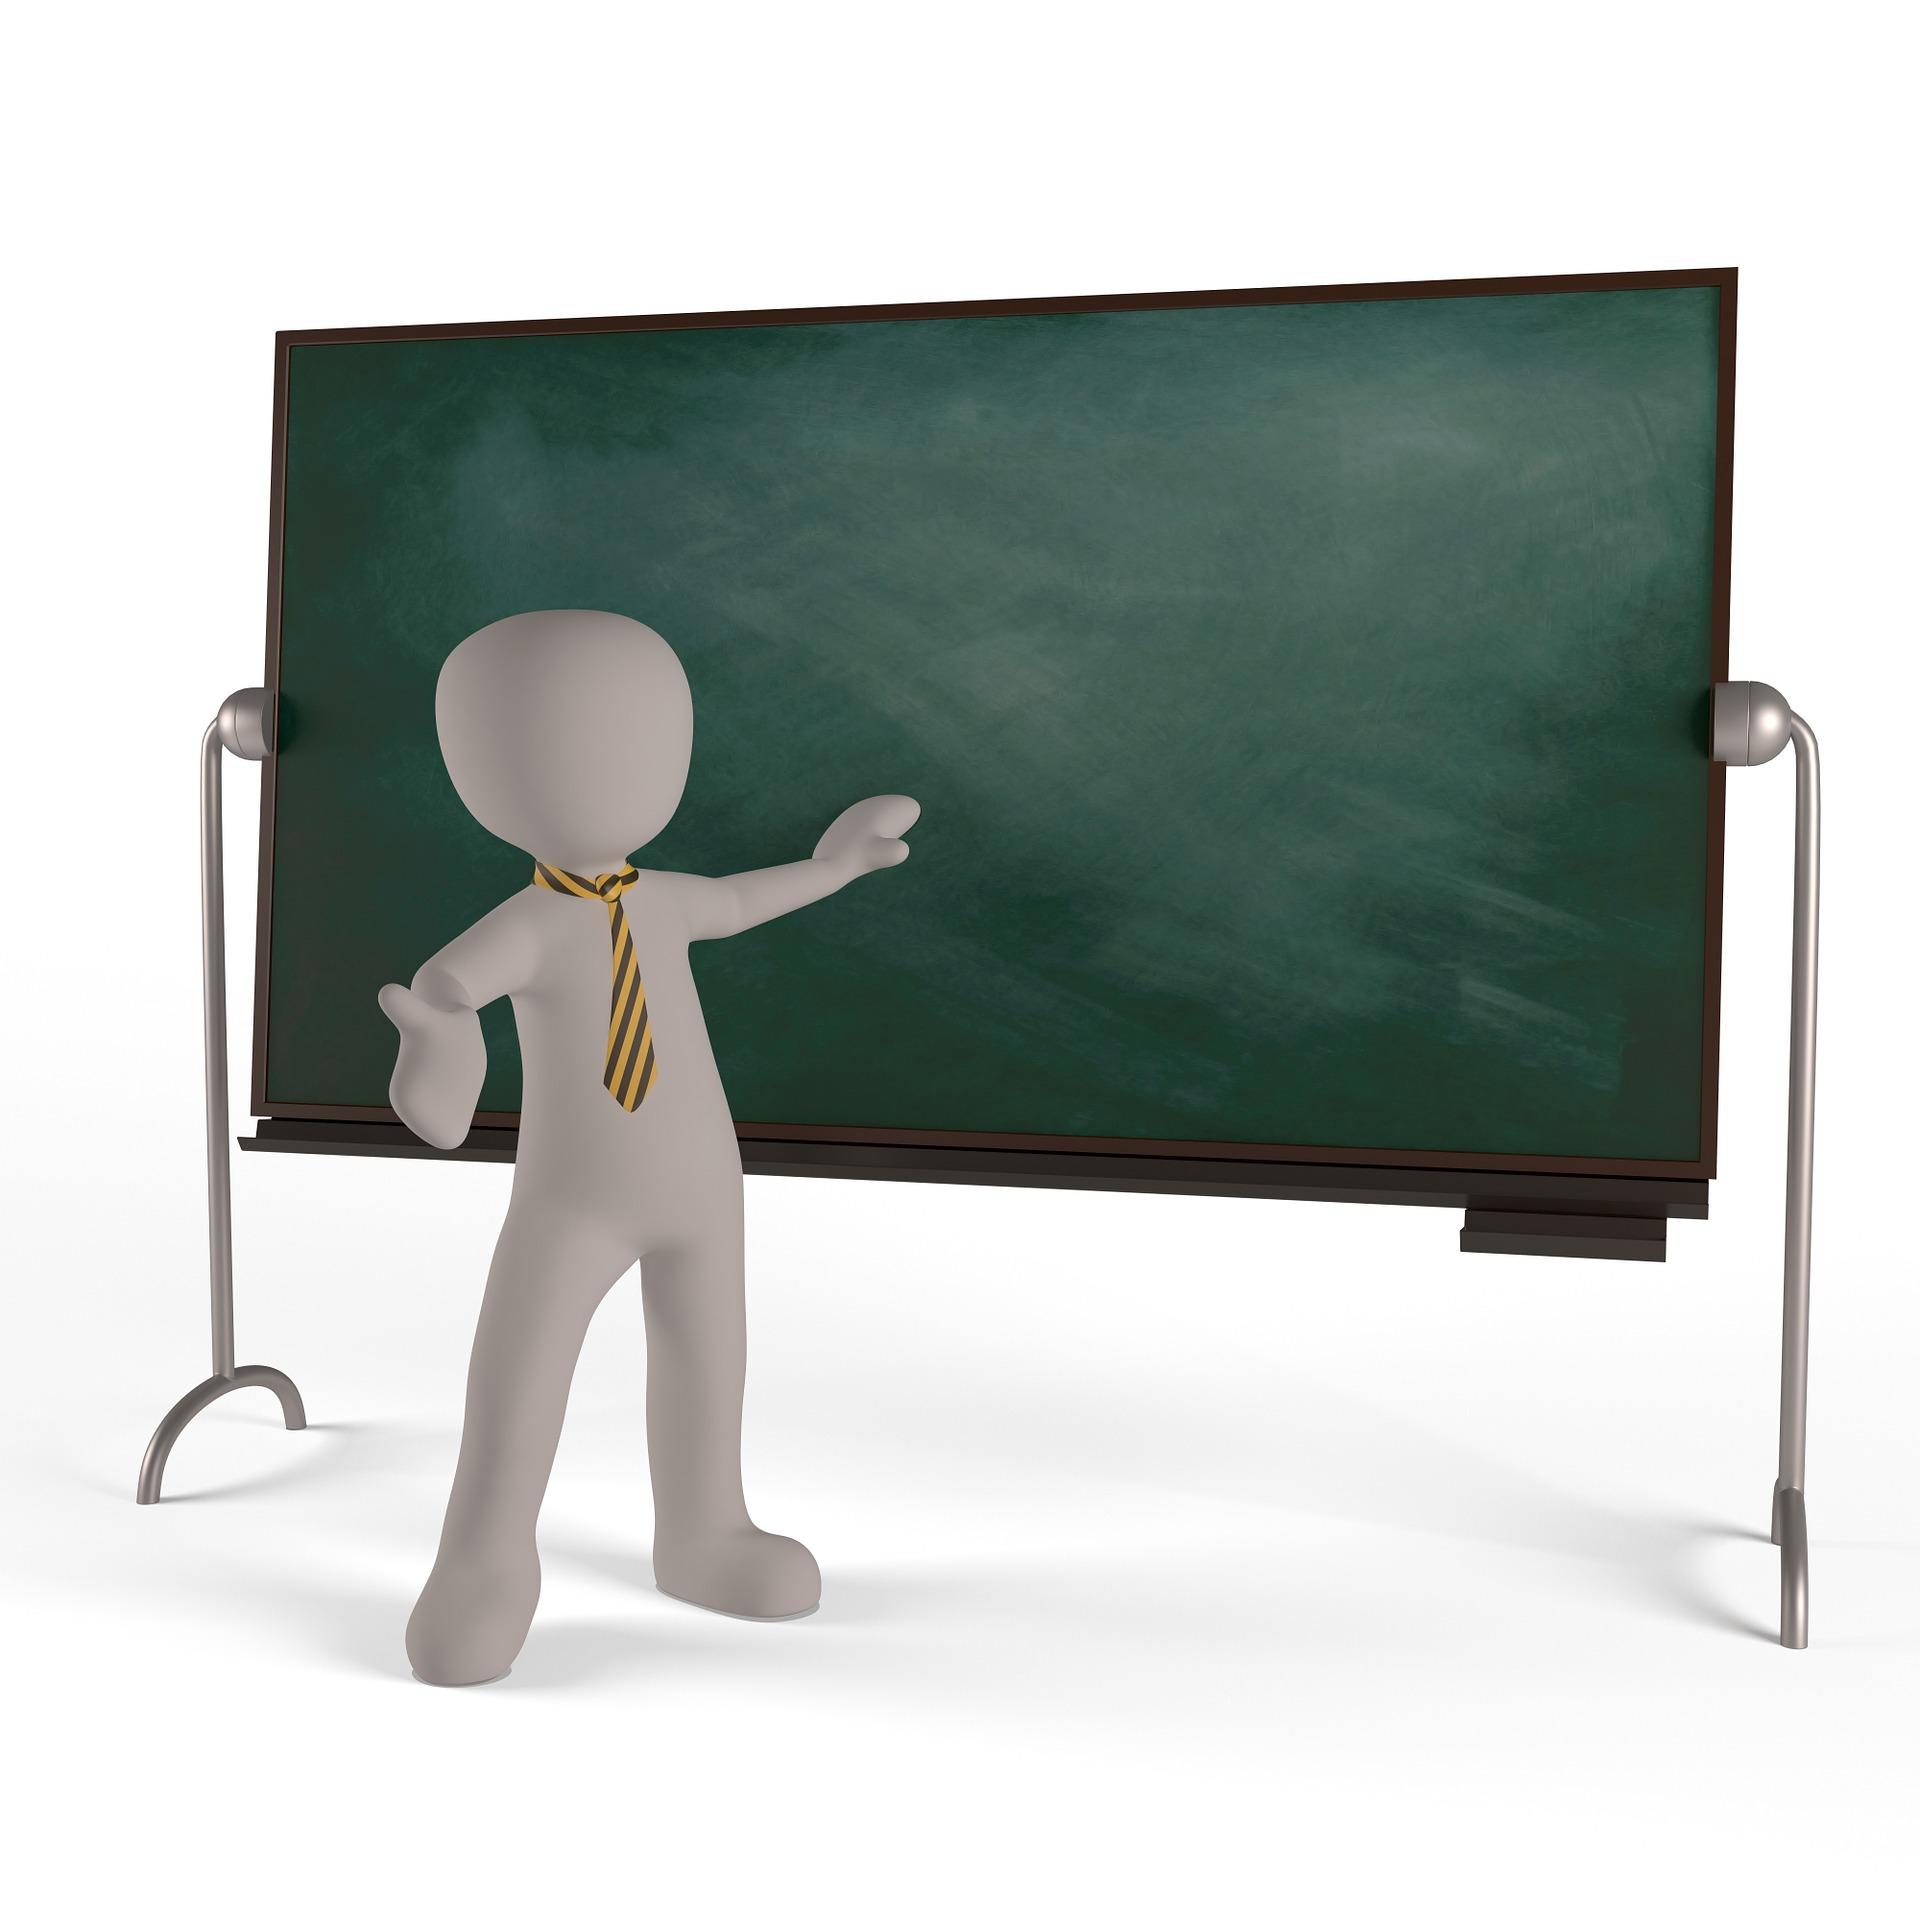 teacher-1015630_1920